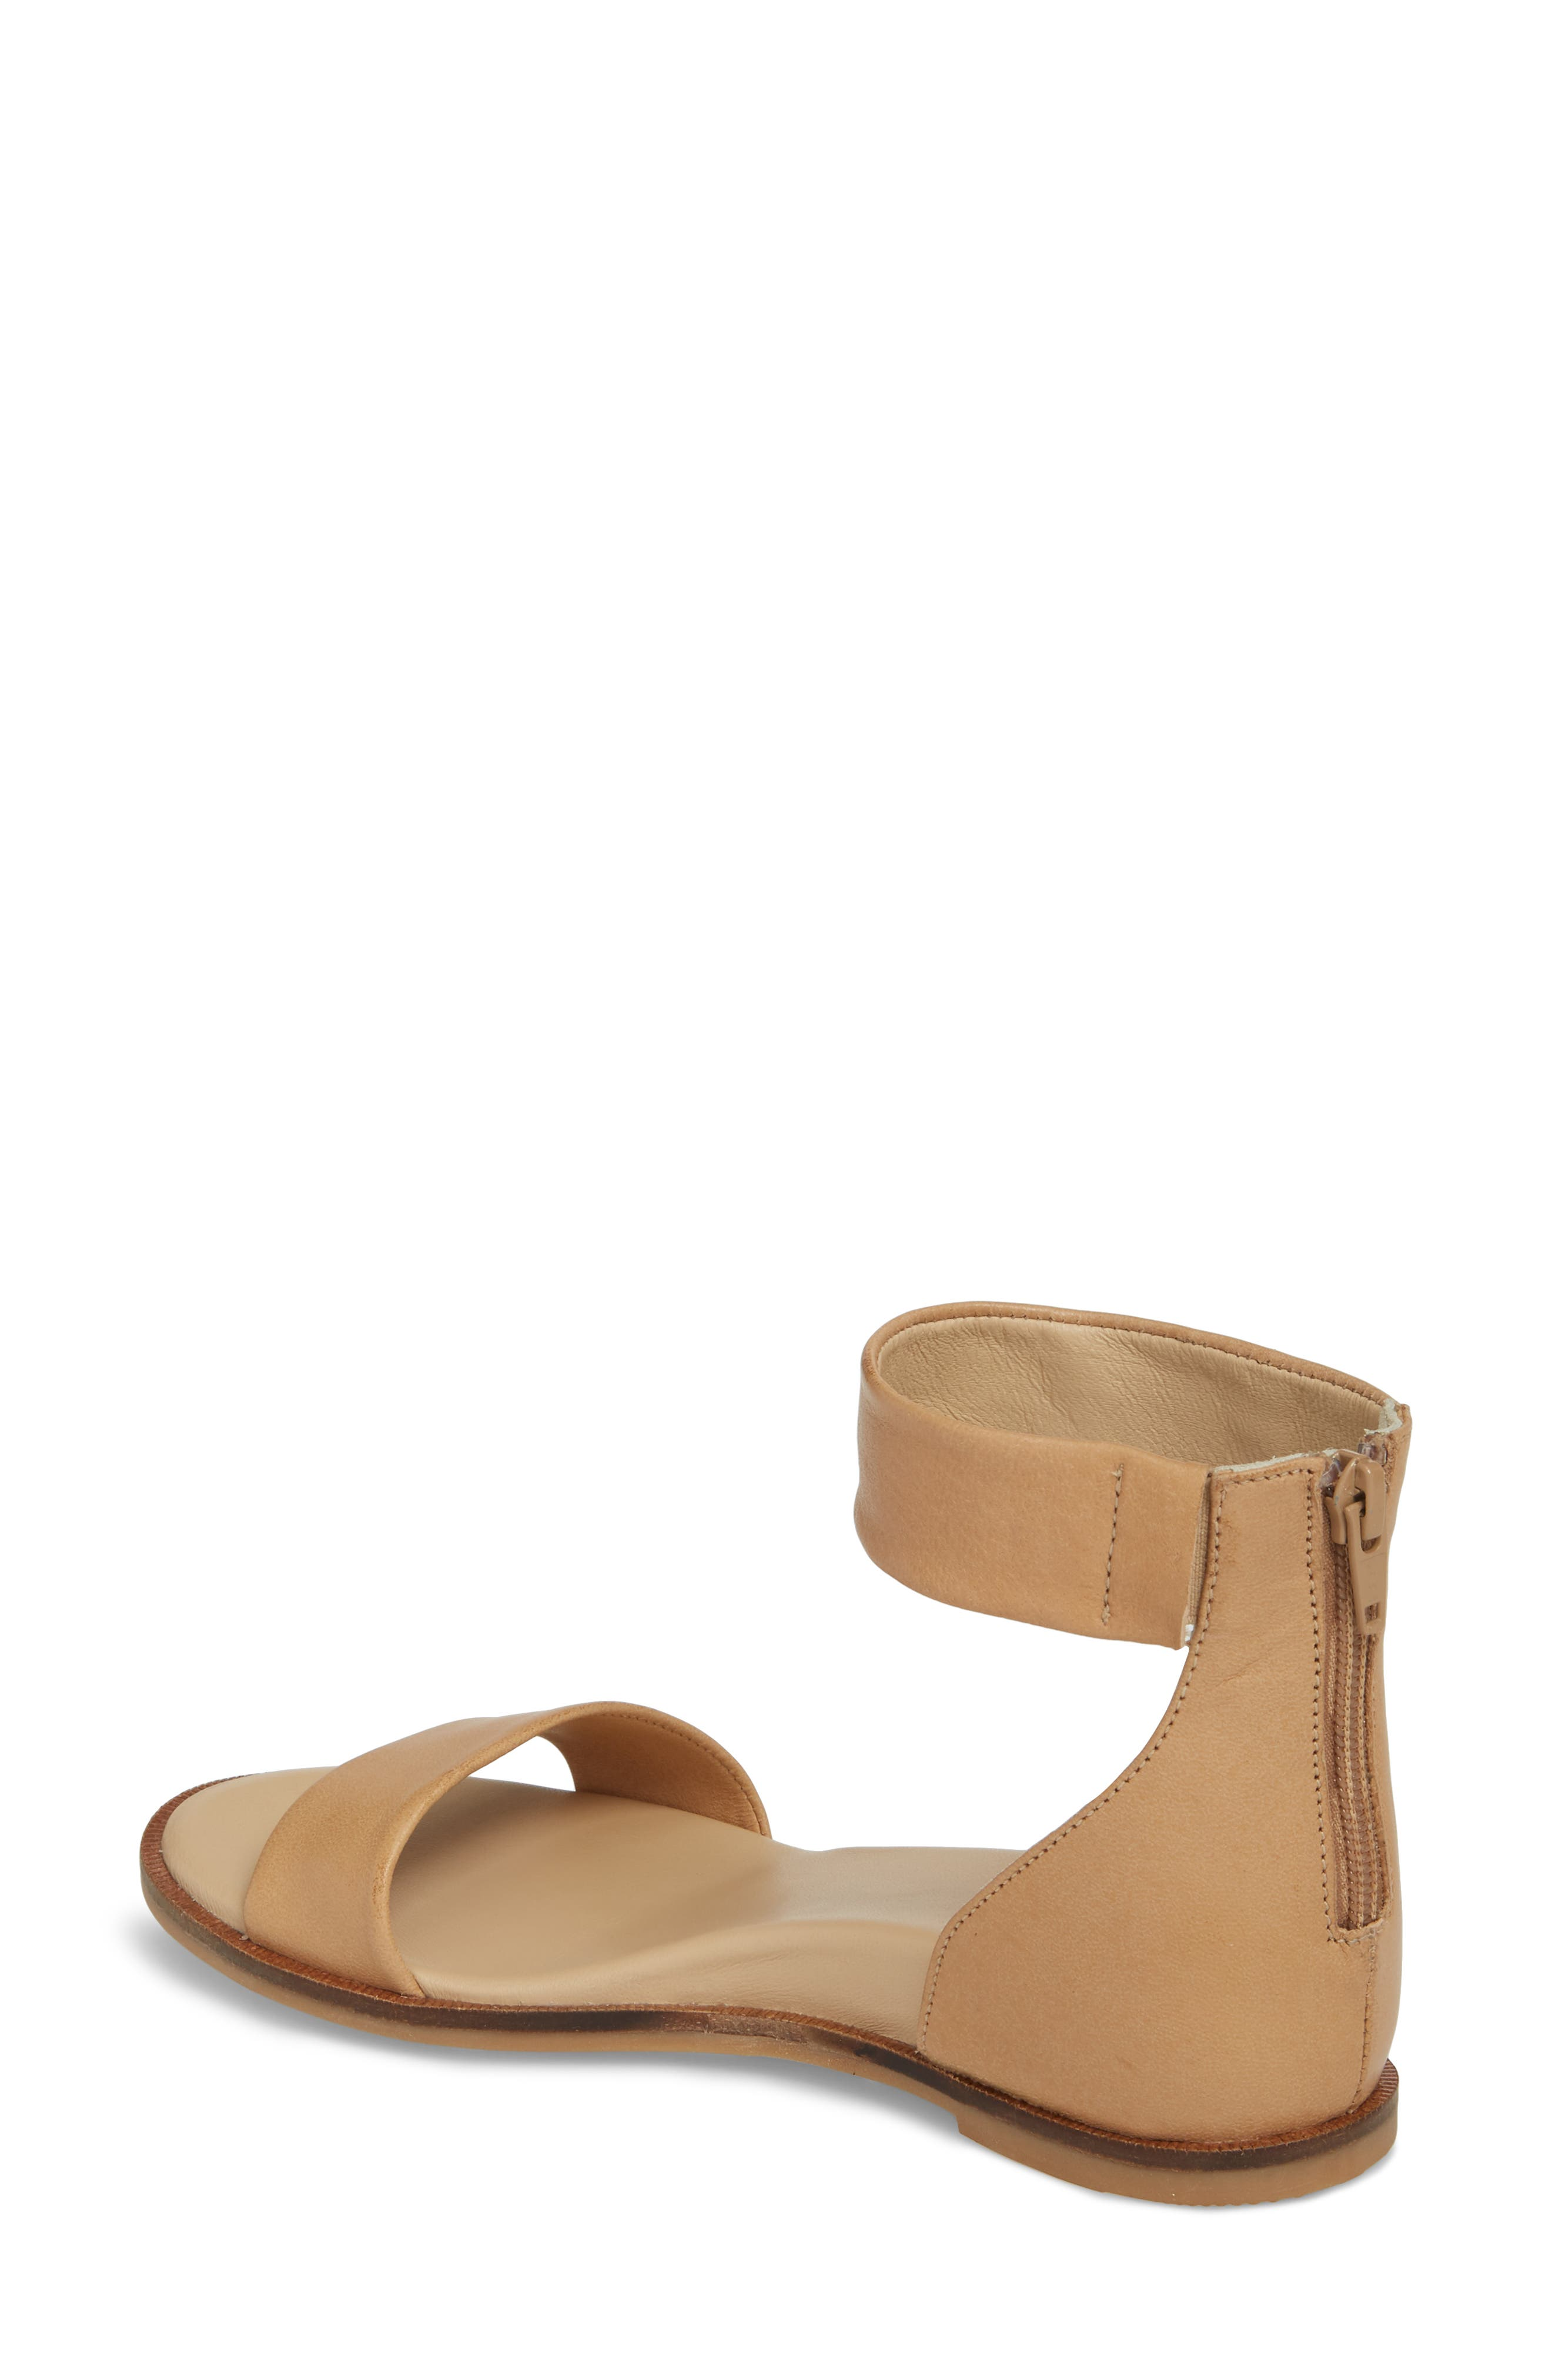 Ankle Strap Sandal,                             Alternate thumbnail 2, color,                             VACCHETTA LEATHER